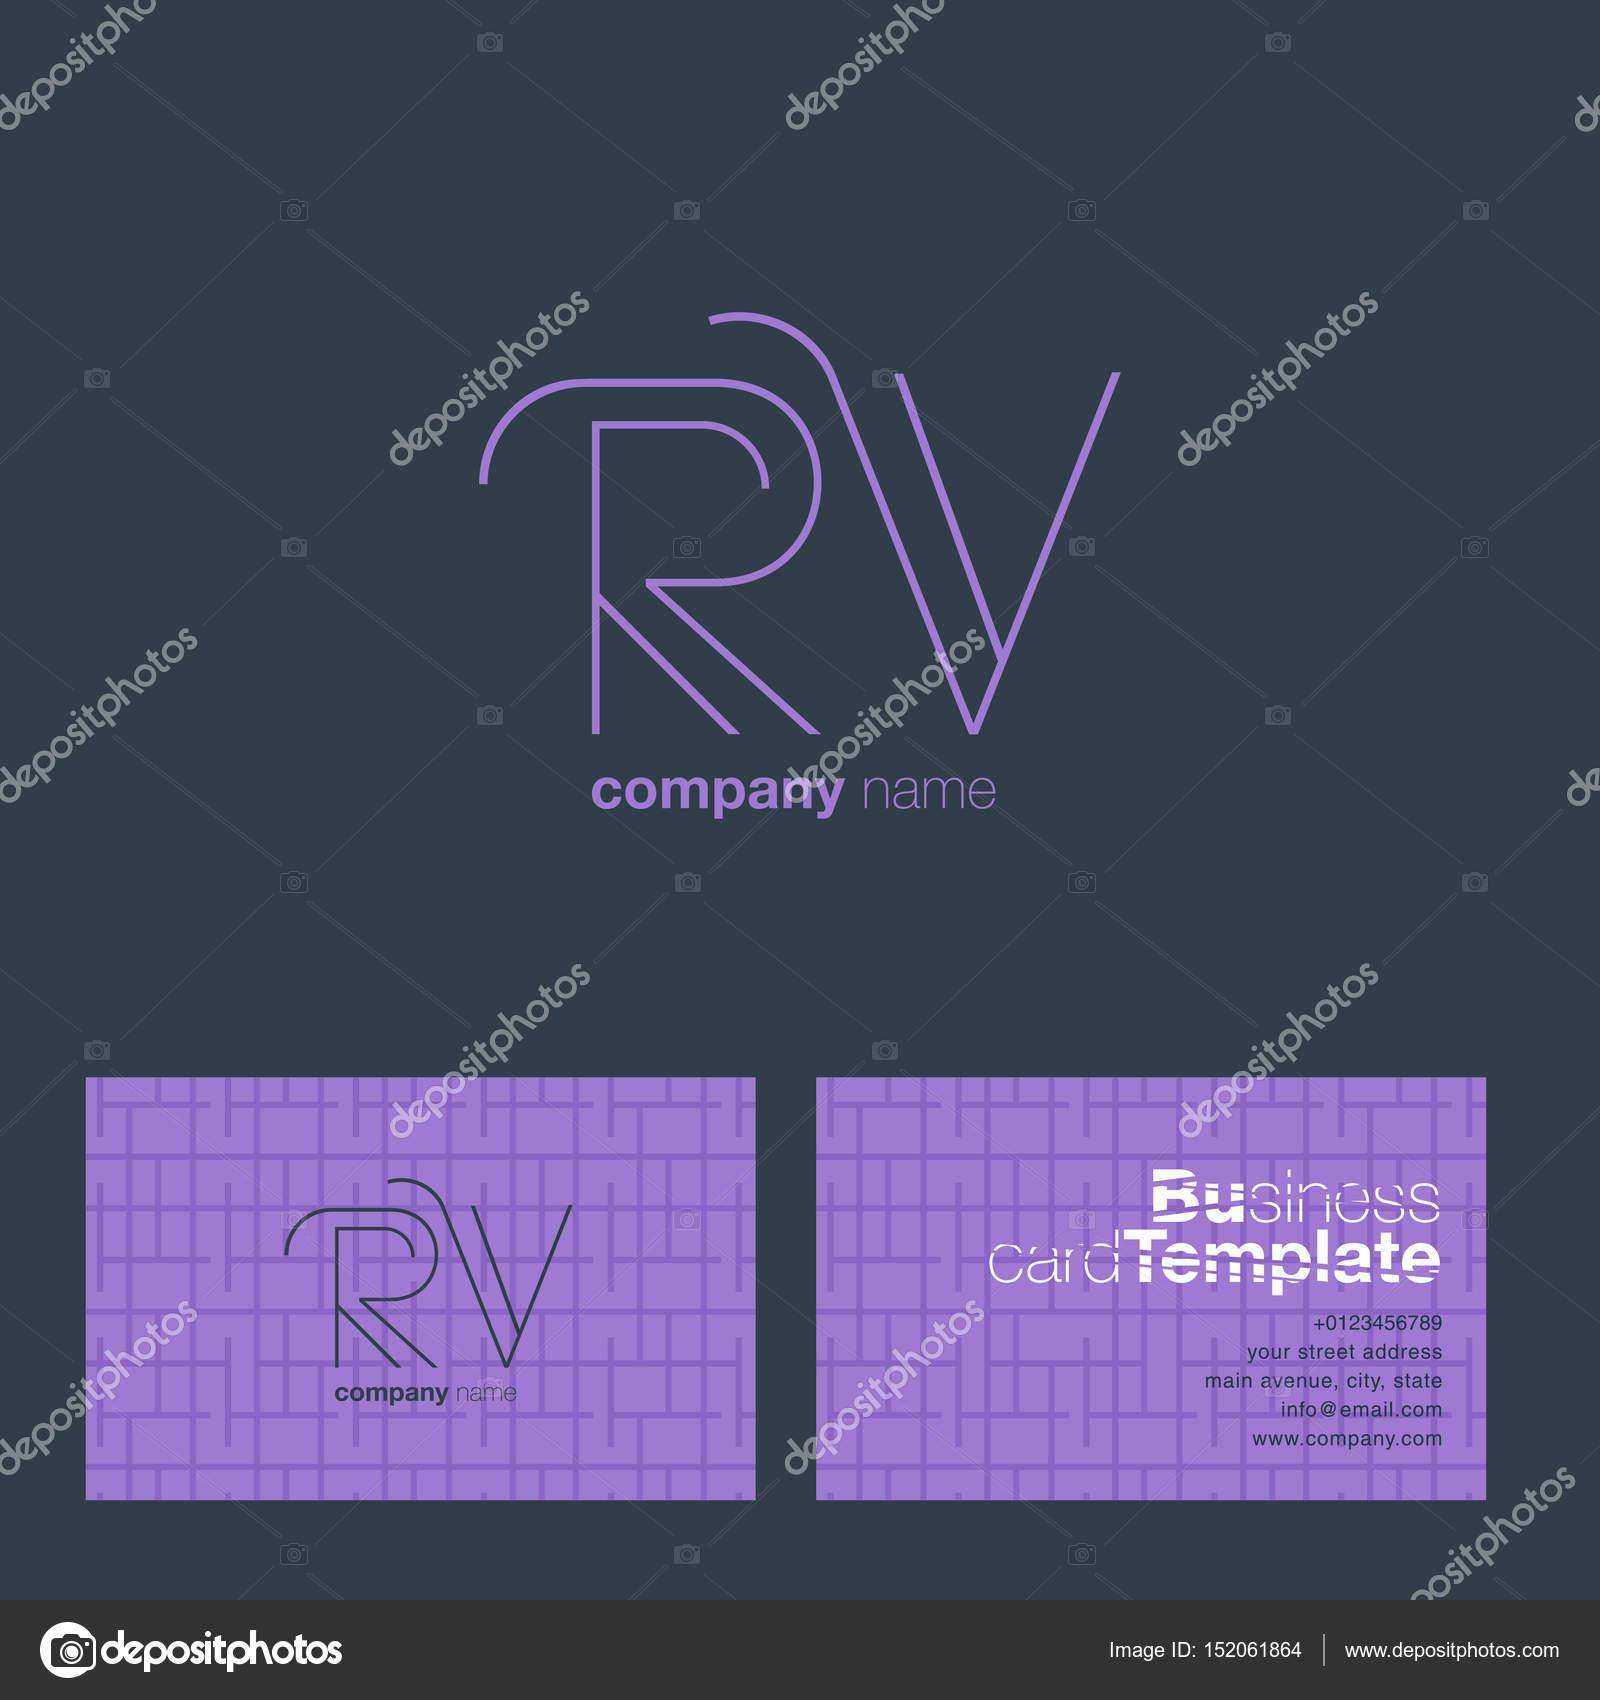 Rv letters logo business card stock vector brainbistro 152061864 rv letters logo business card stock vector colourmoves